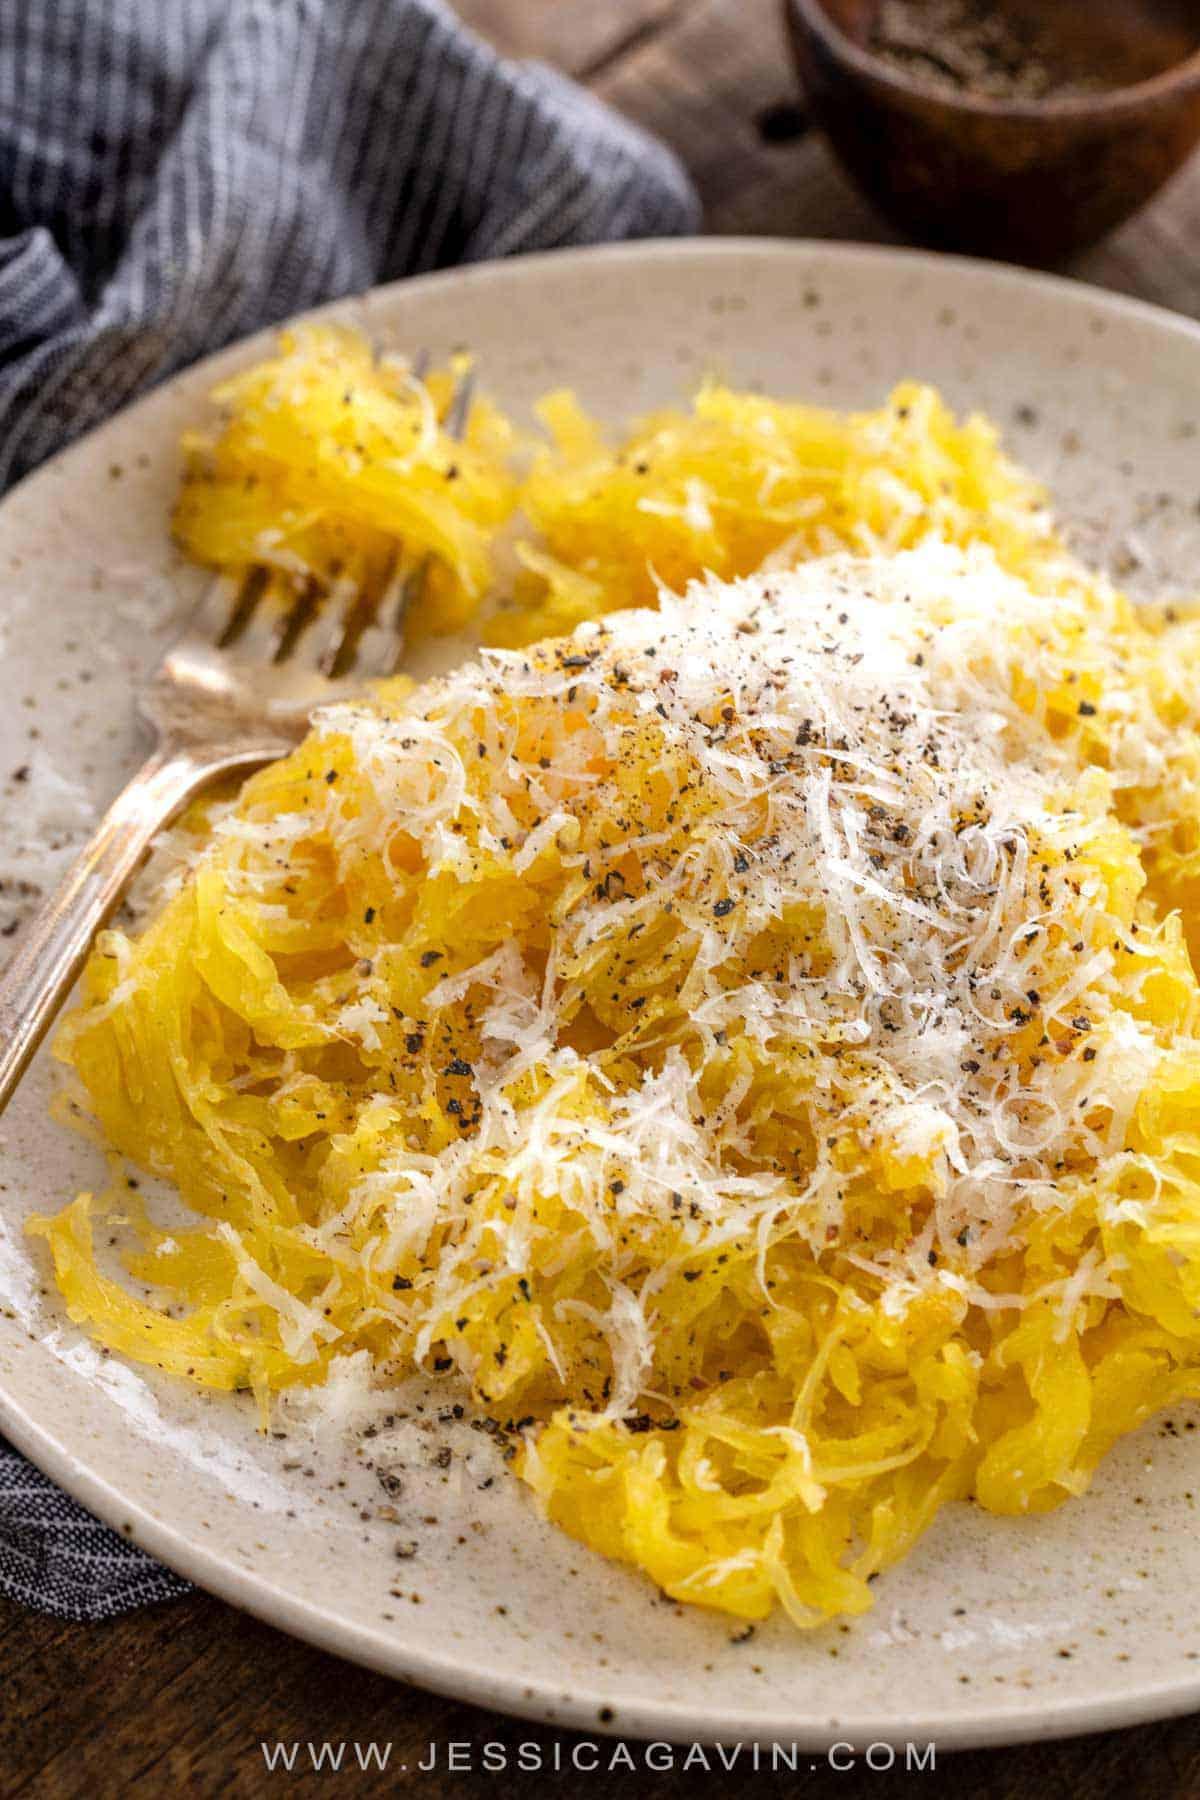 Low carb version of Italian Cacio e Pepe recipe that is lightened up by substituting roasted spaghetti squash for pasta noodles. #spaghettisquash #italianrecipe #lowcarb #skinnytaste